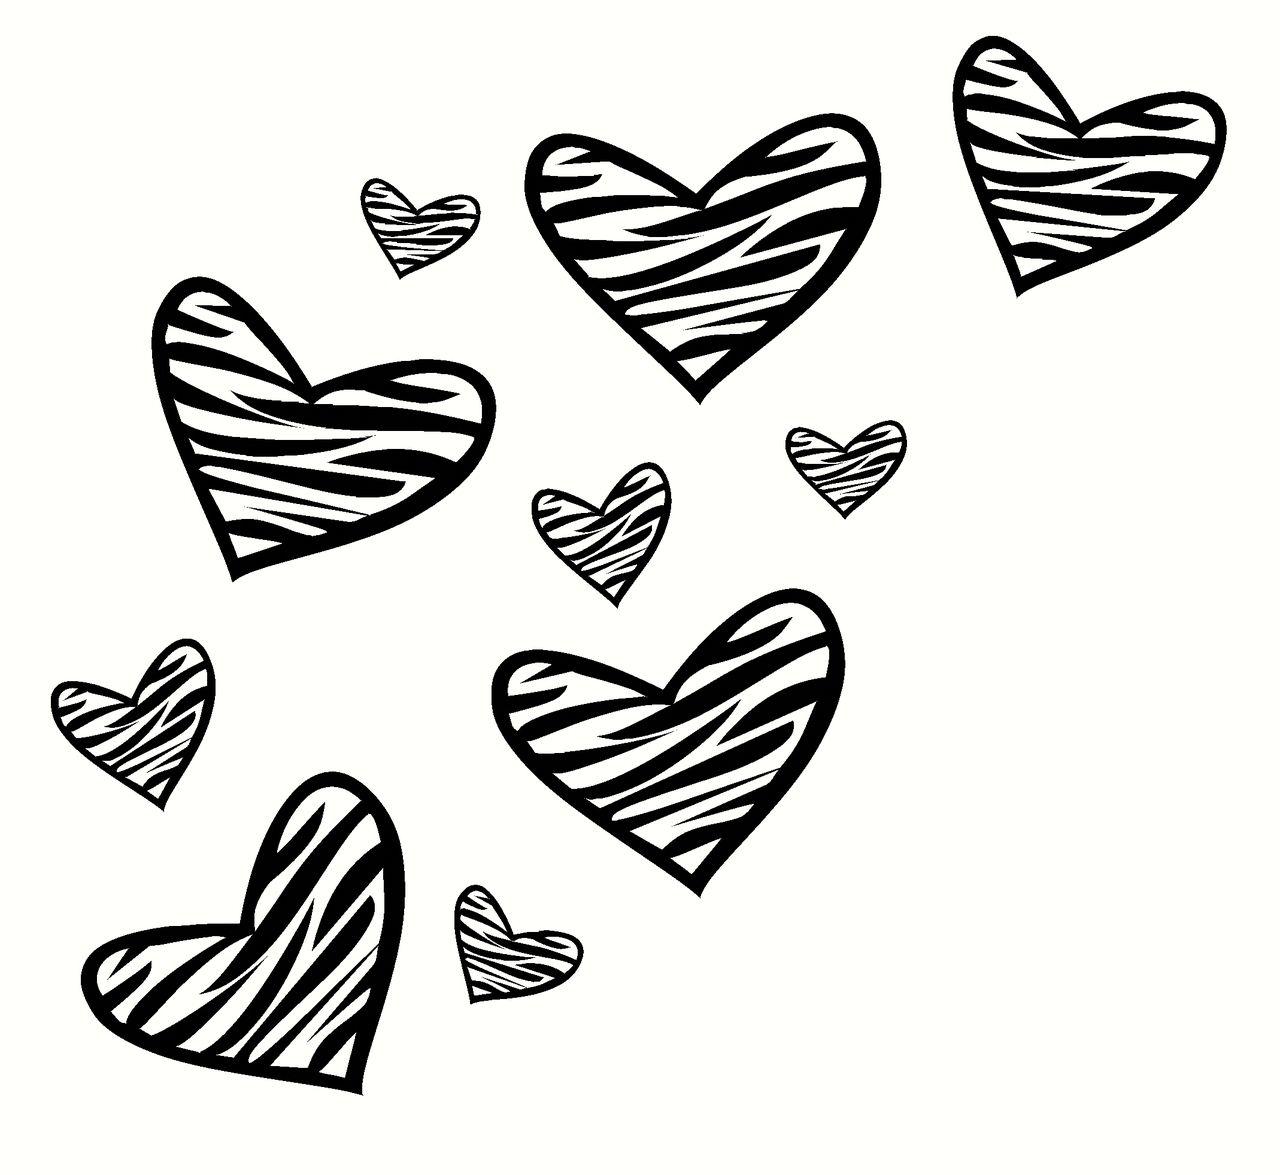 Zebra Print Heart Wall Decor Vinyl Decal Stickers 10pc